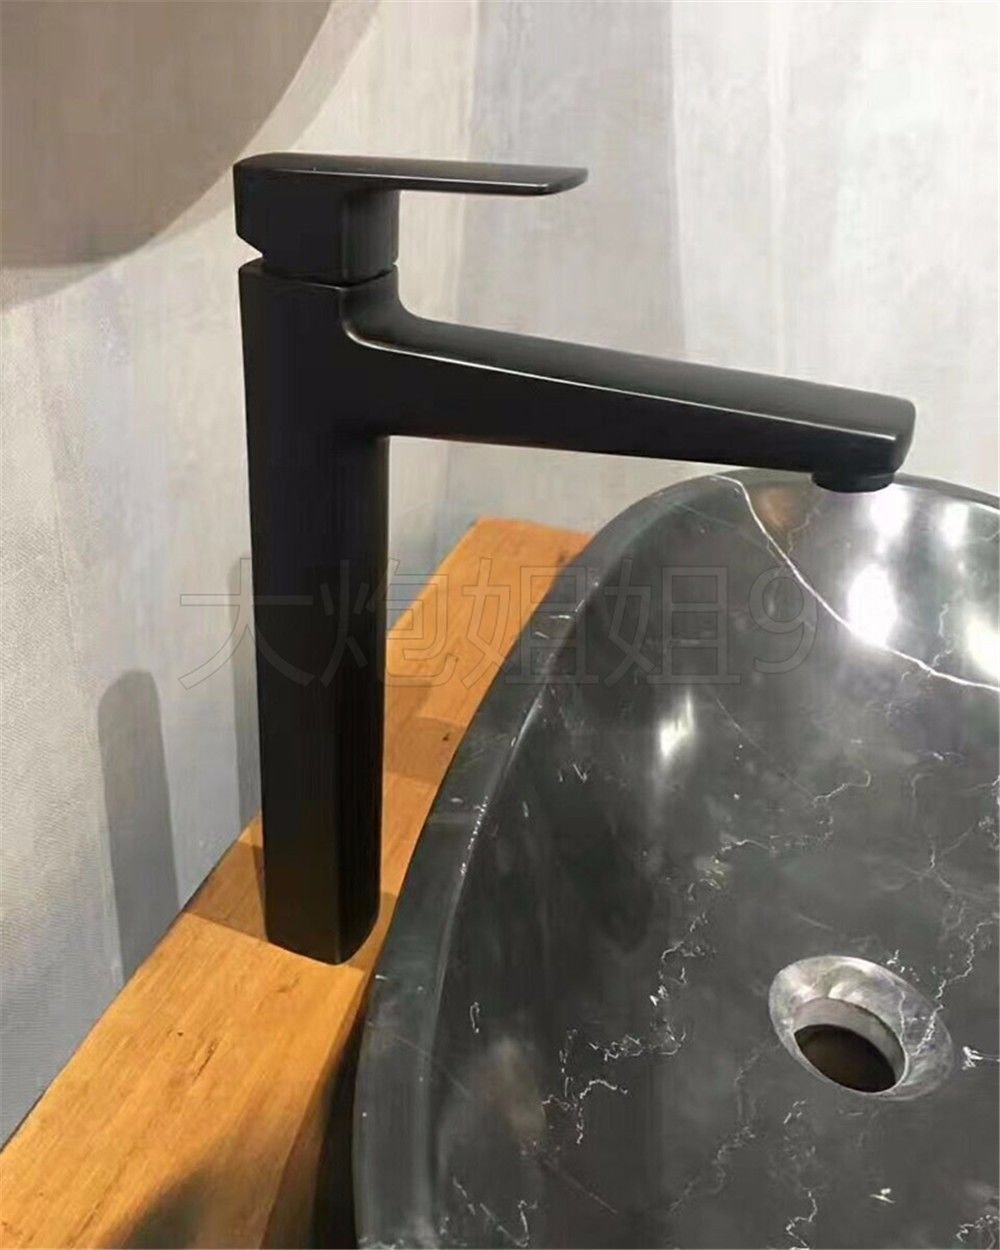 Gyps Faucet Basin Mixer Tap Waterfall Faucet Antique Bathroom Mixer Bar Mixer Shower Set Tap antique bathroom faucet The Copper Black matte black basin mixer basin mixer basin mixer high-feet tall and